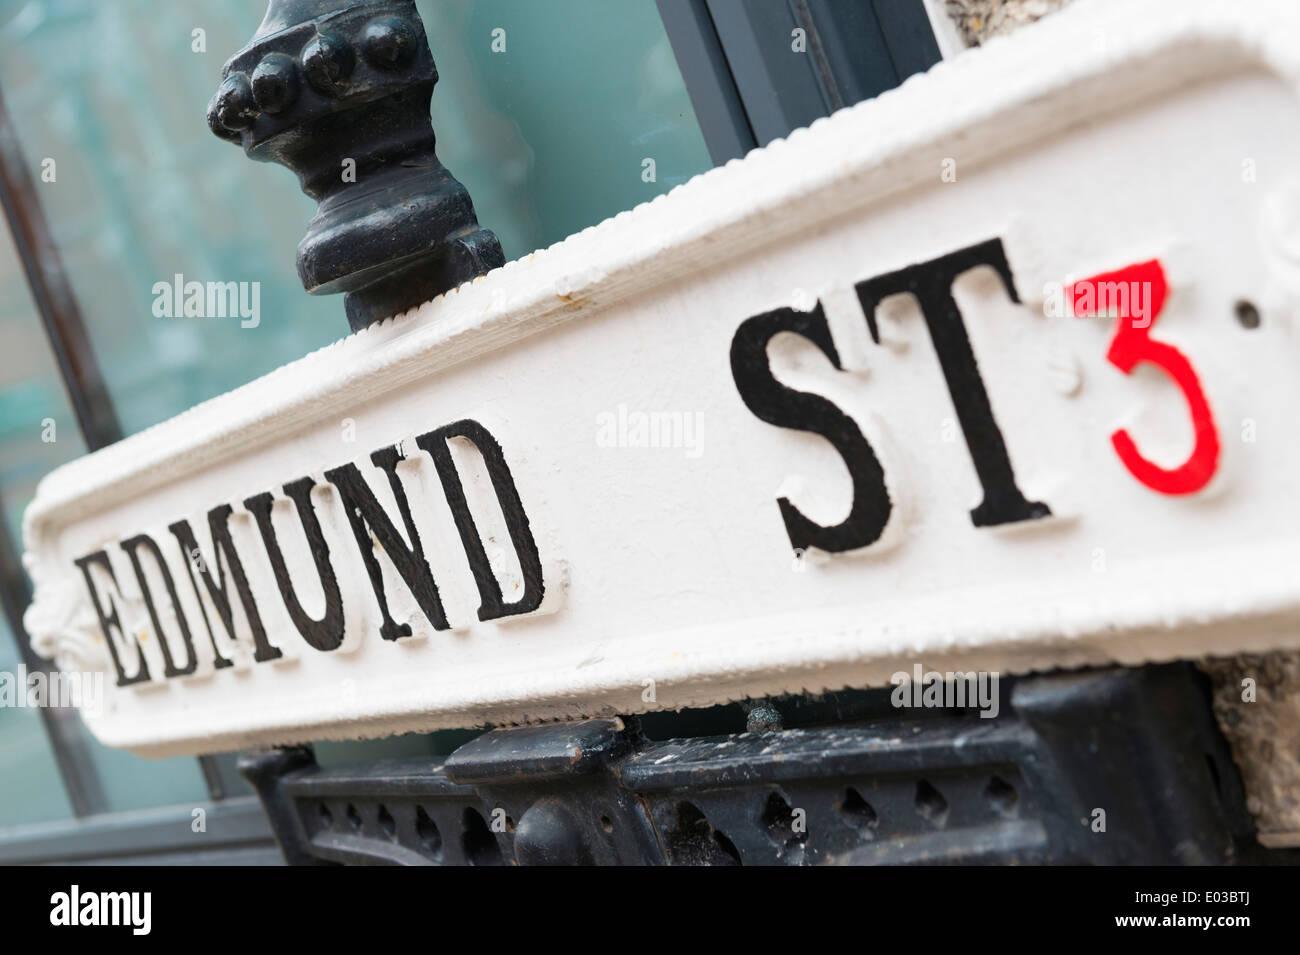 Edmund Street sign, Birmingham - Stock Image